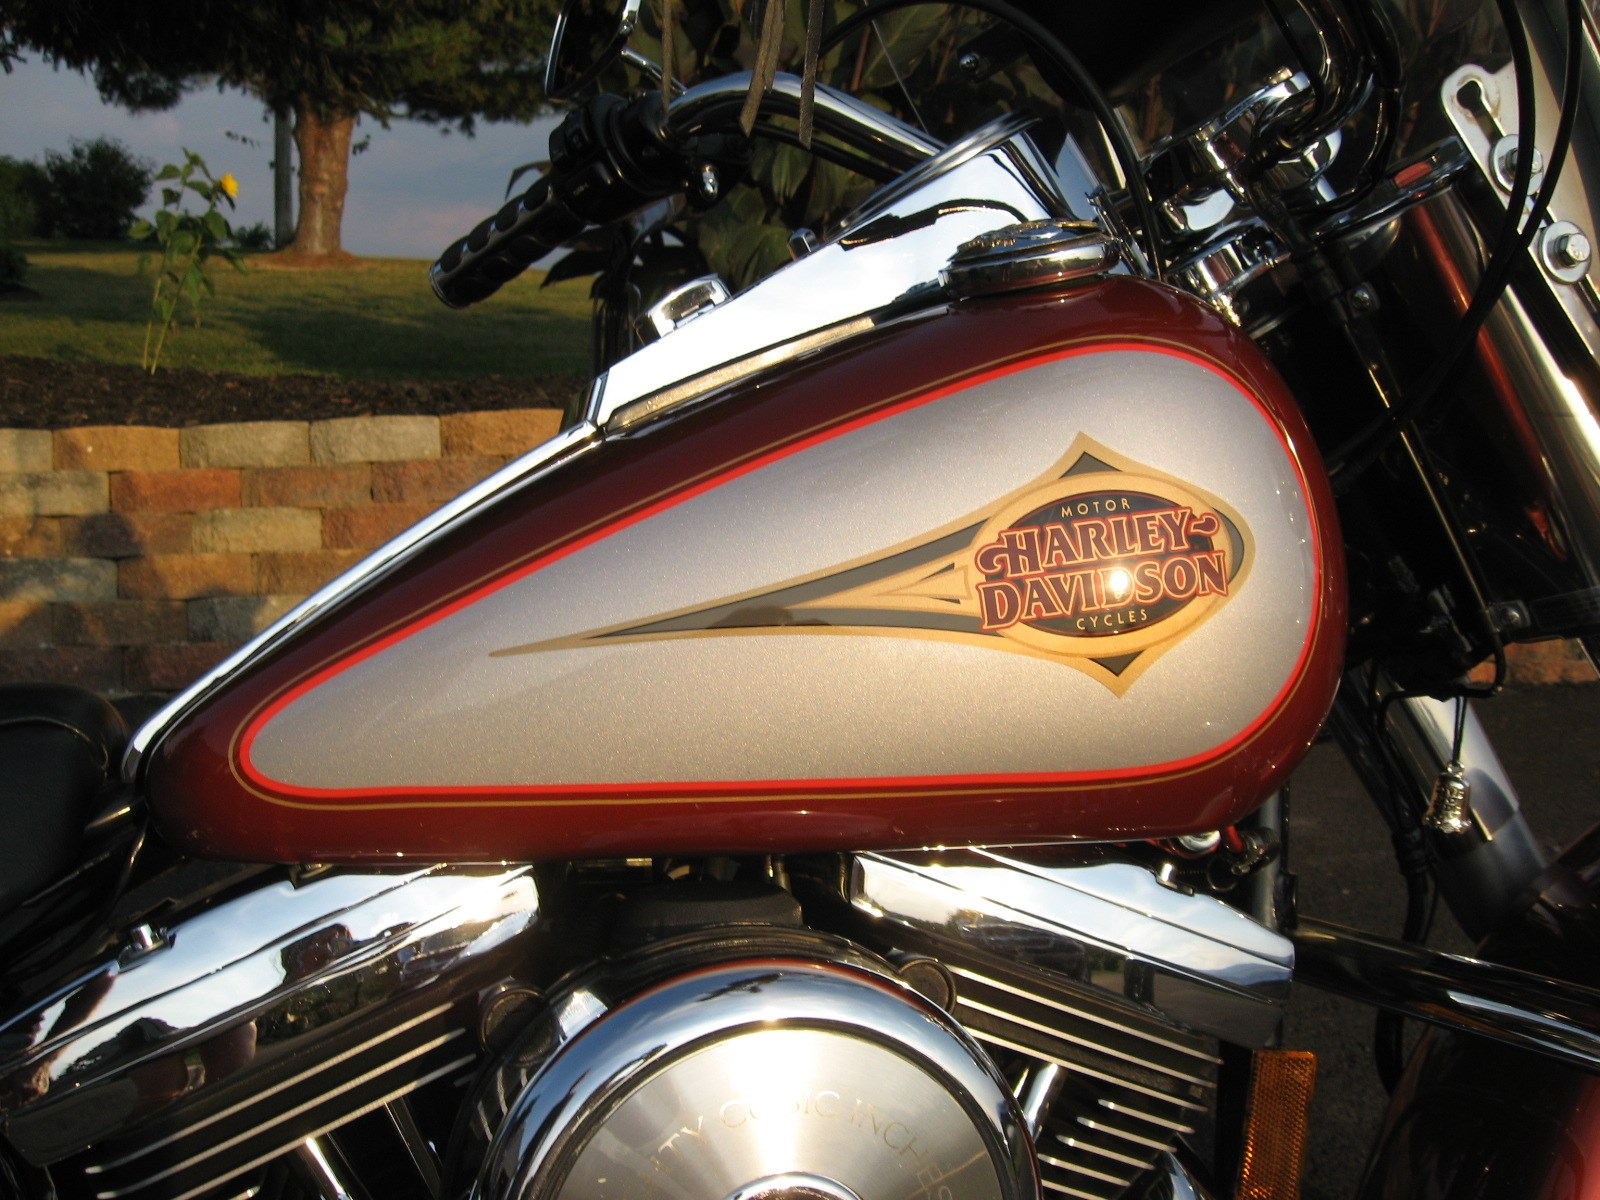 1999 Harley Davidson 174 Flstc Heritage Softail 174 Classic